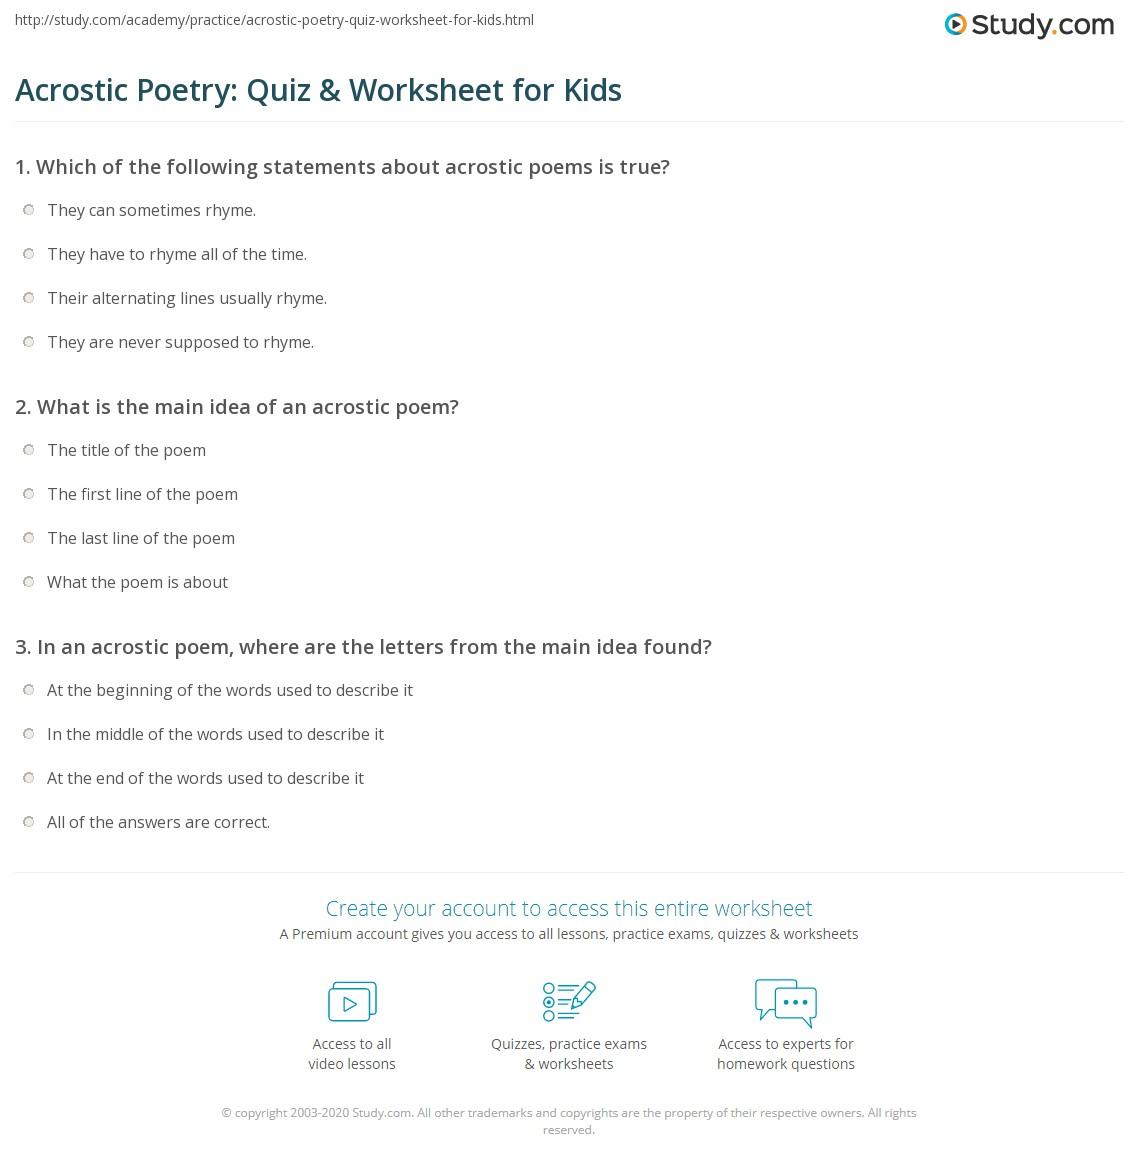 hight resolution of Acrostic Poetry: Quiz \u0026 Worksheet for Kids   Study.com